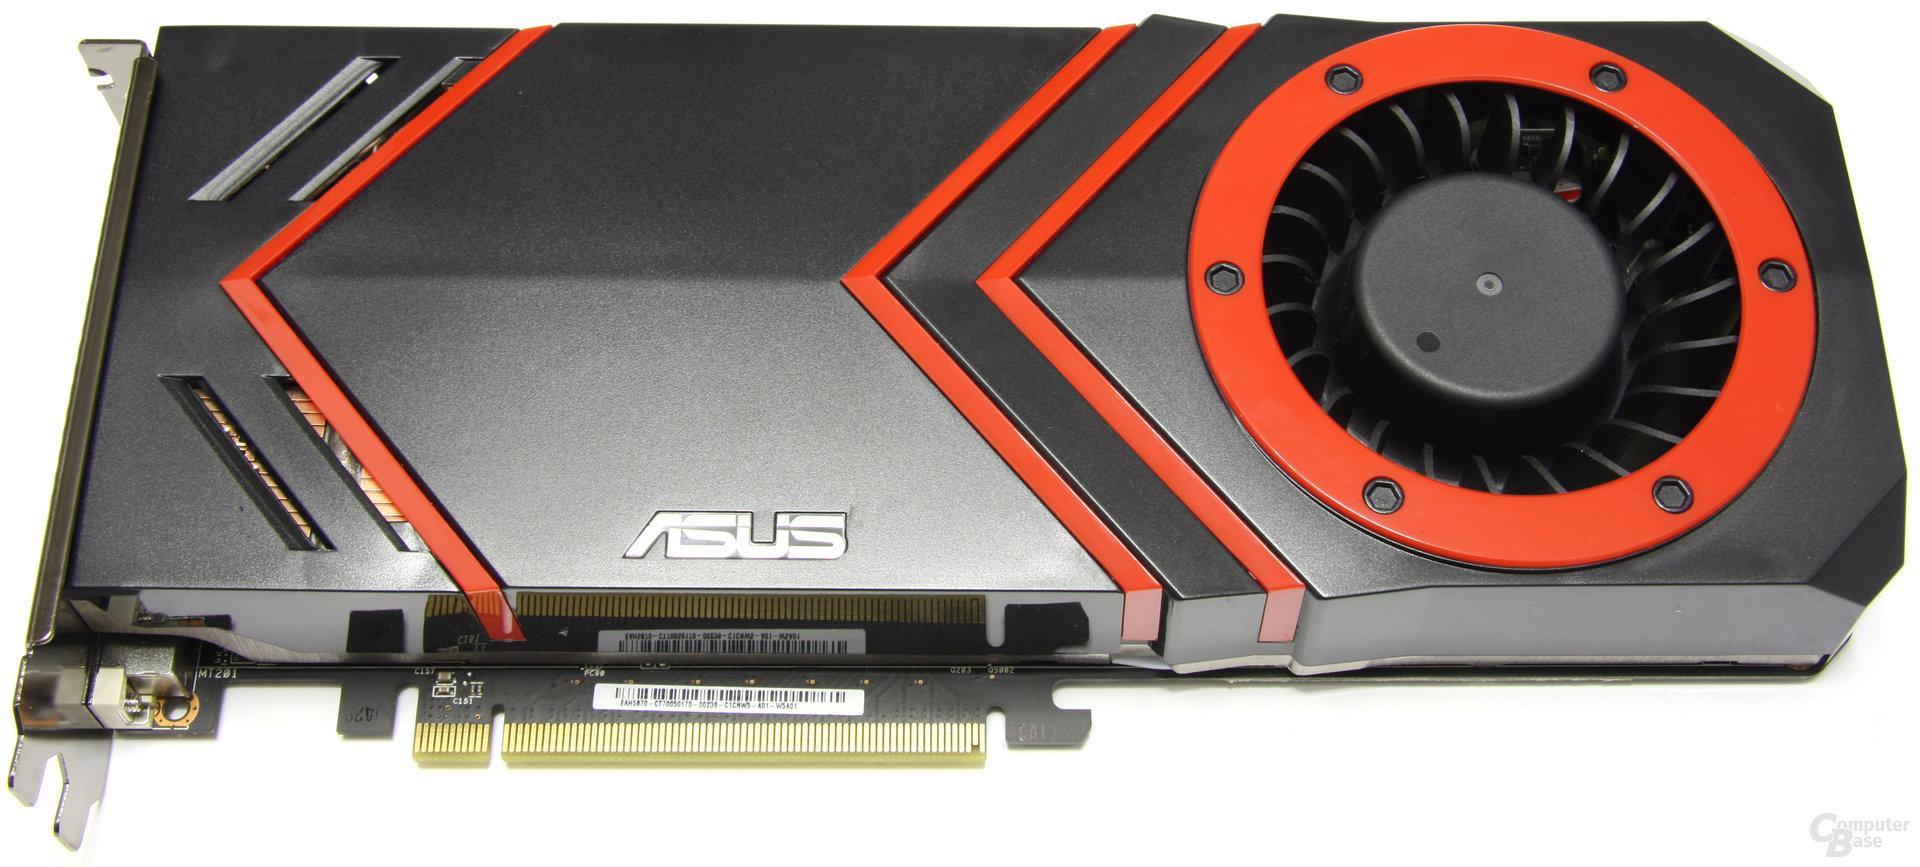 Asus Radeon HD 5870 V2